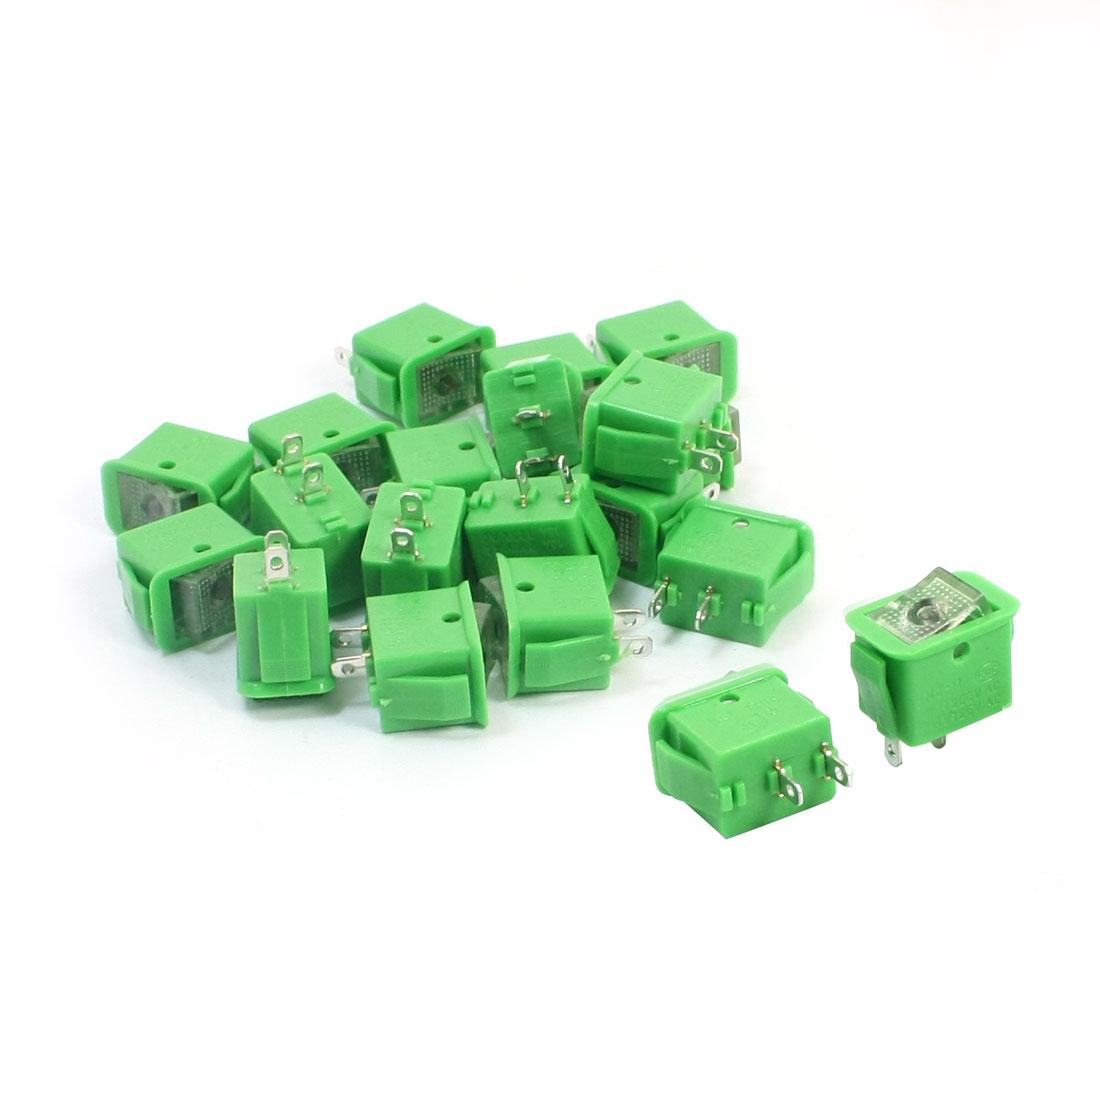 20pcs Green Latching SPST 2 Positions Rocker Switch AC250V/10A 125V/13A